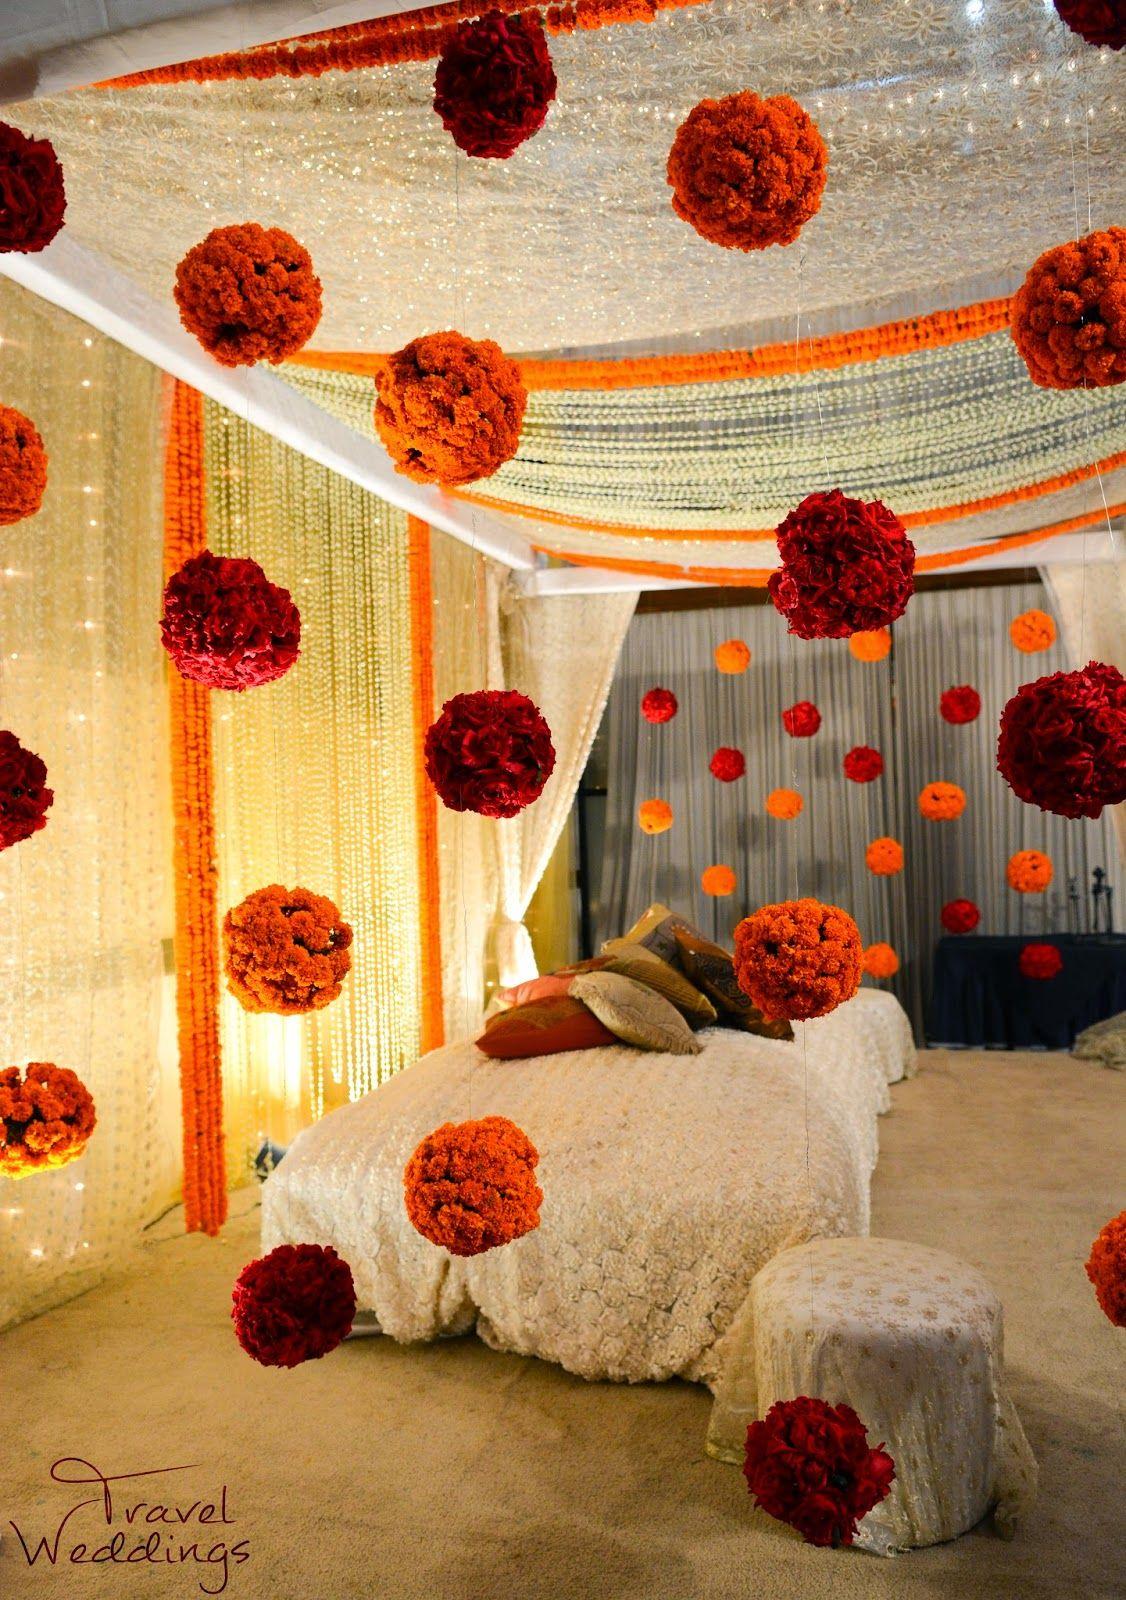 Travel weddings raon5 1126 1600 wedding decor for Indoor diwali decoration